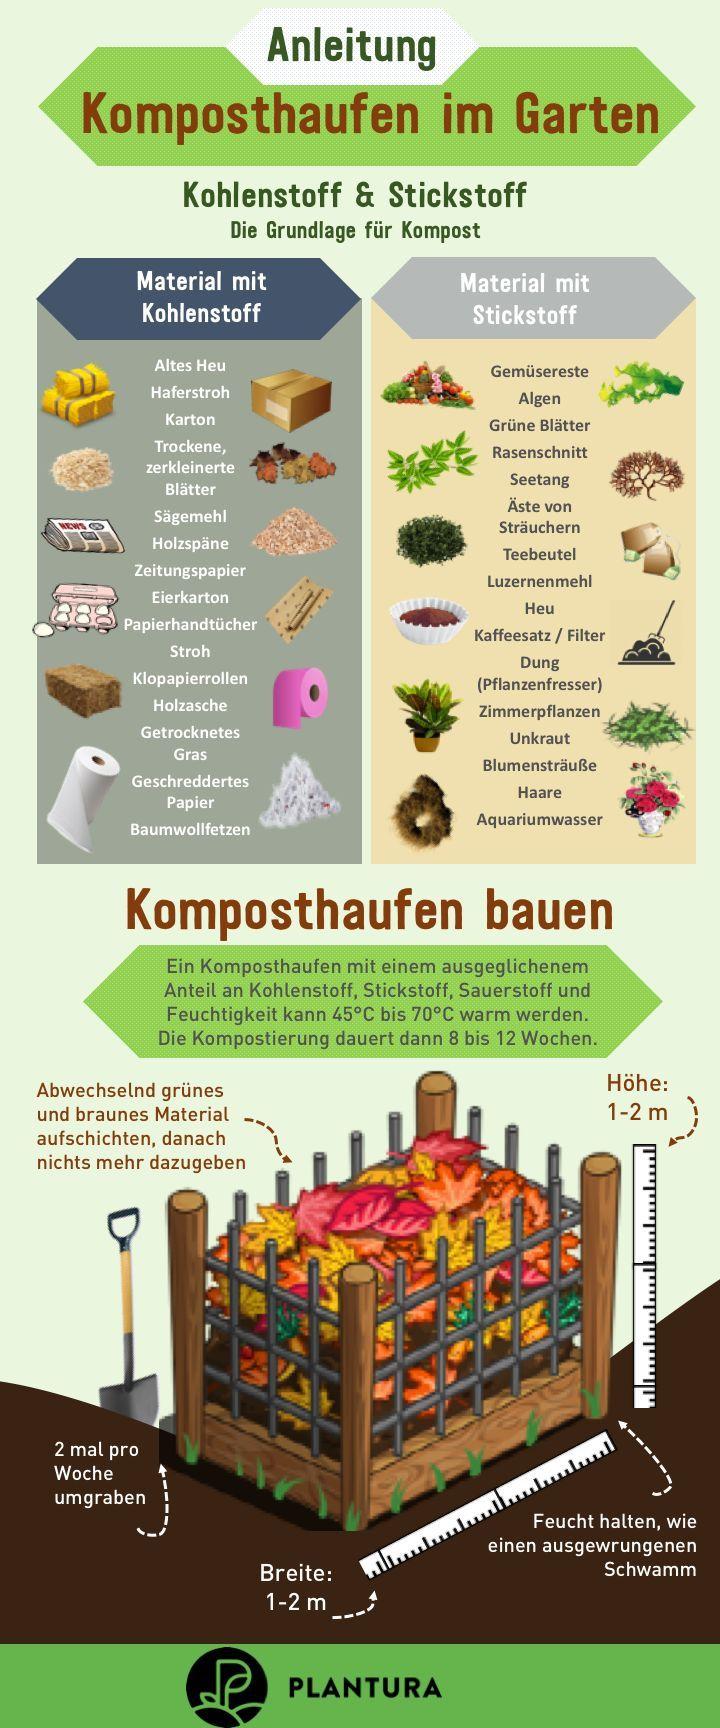 Kompost Anlegen Bauen Anleitung Komposthaufen Im Anleitung Komposthaufen Im Garten Kohlenstoff Amp Stickstoff Komposthaufen Kompost Kompostierung